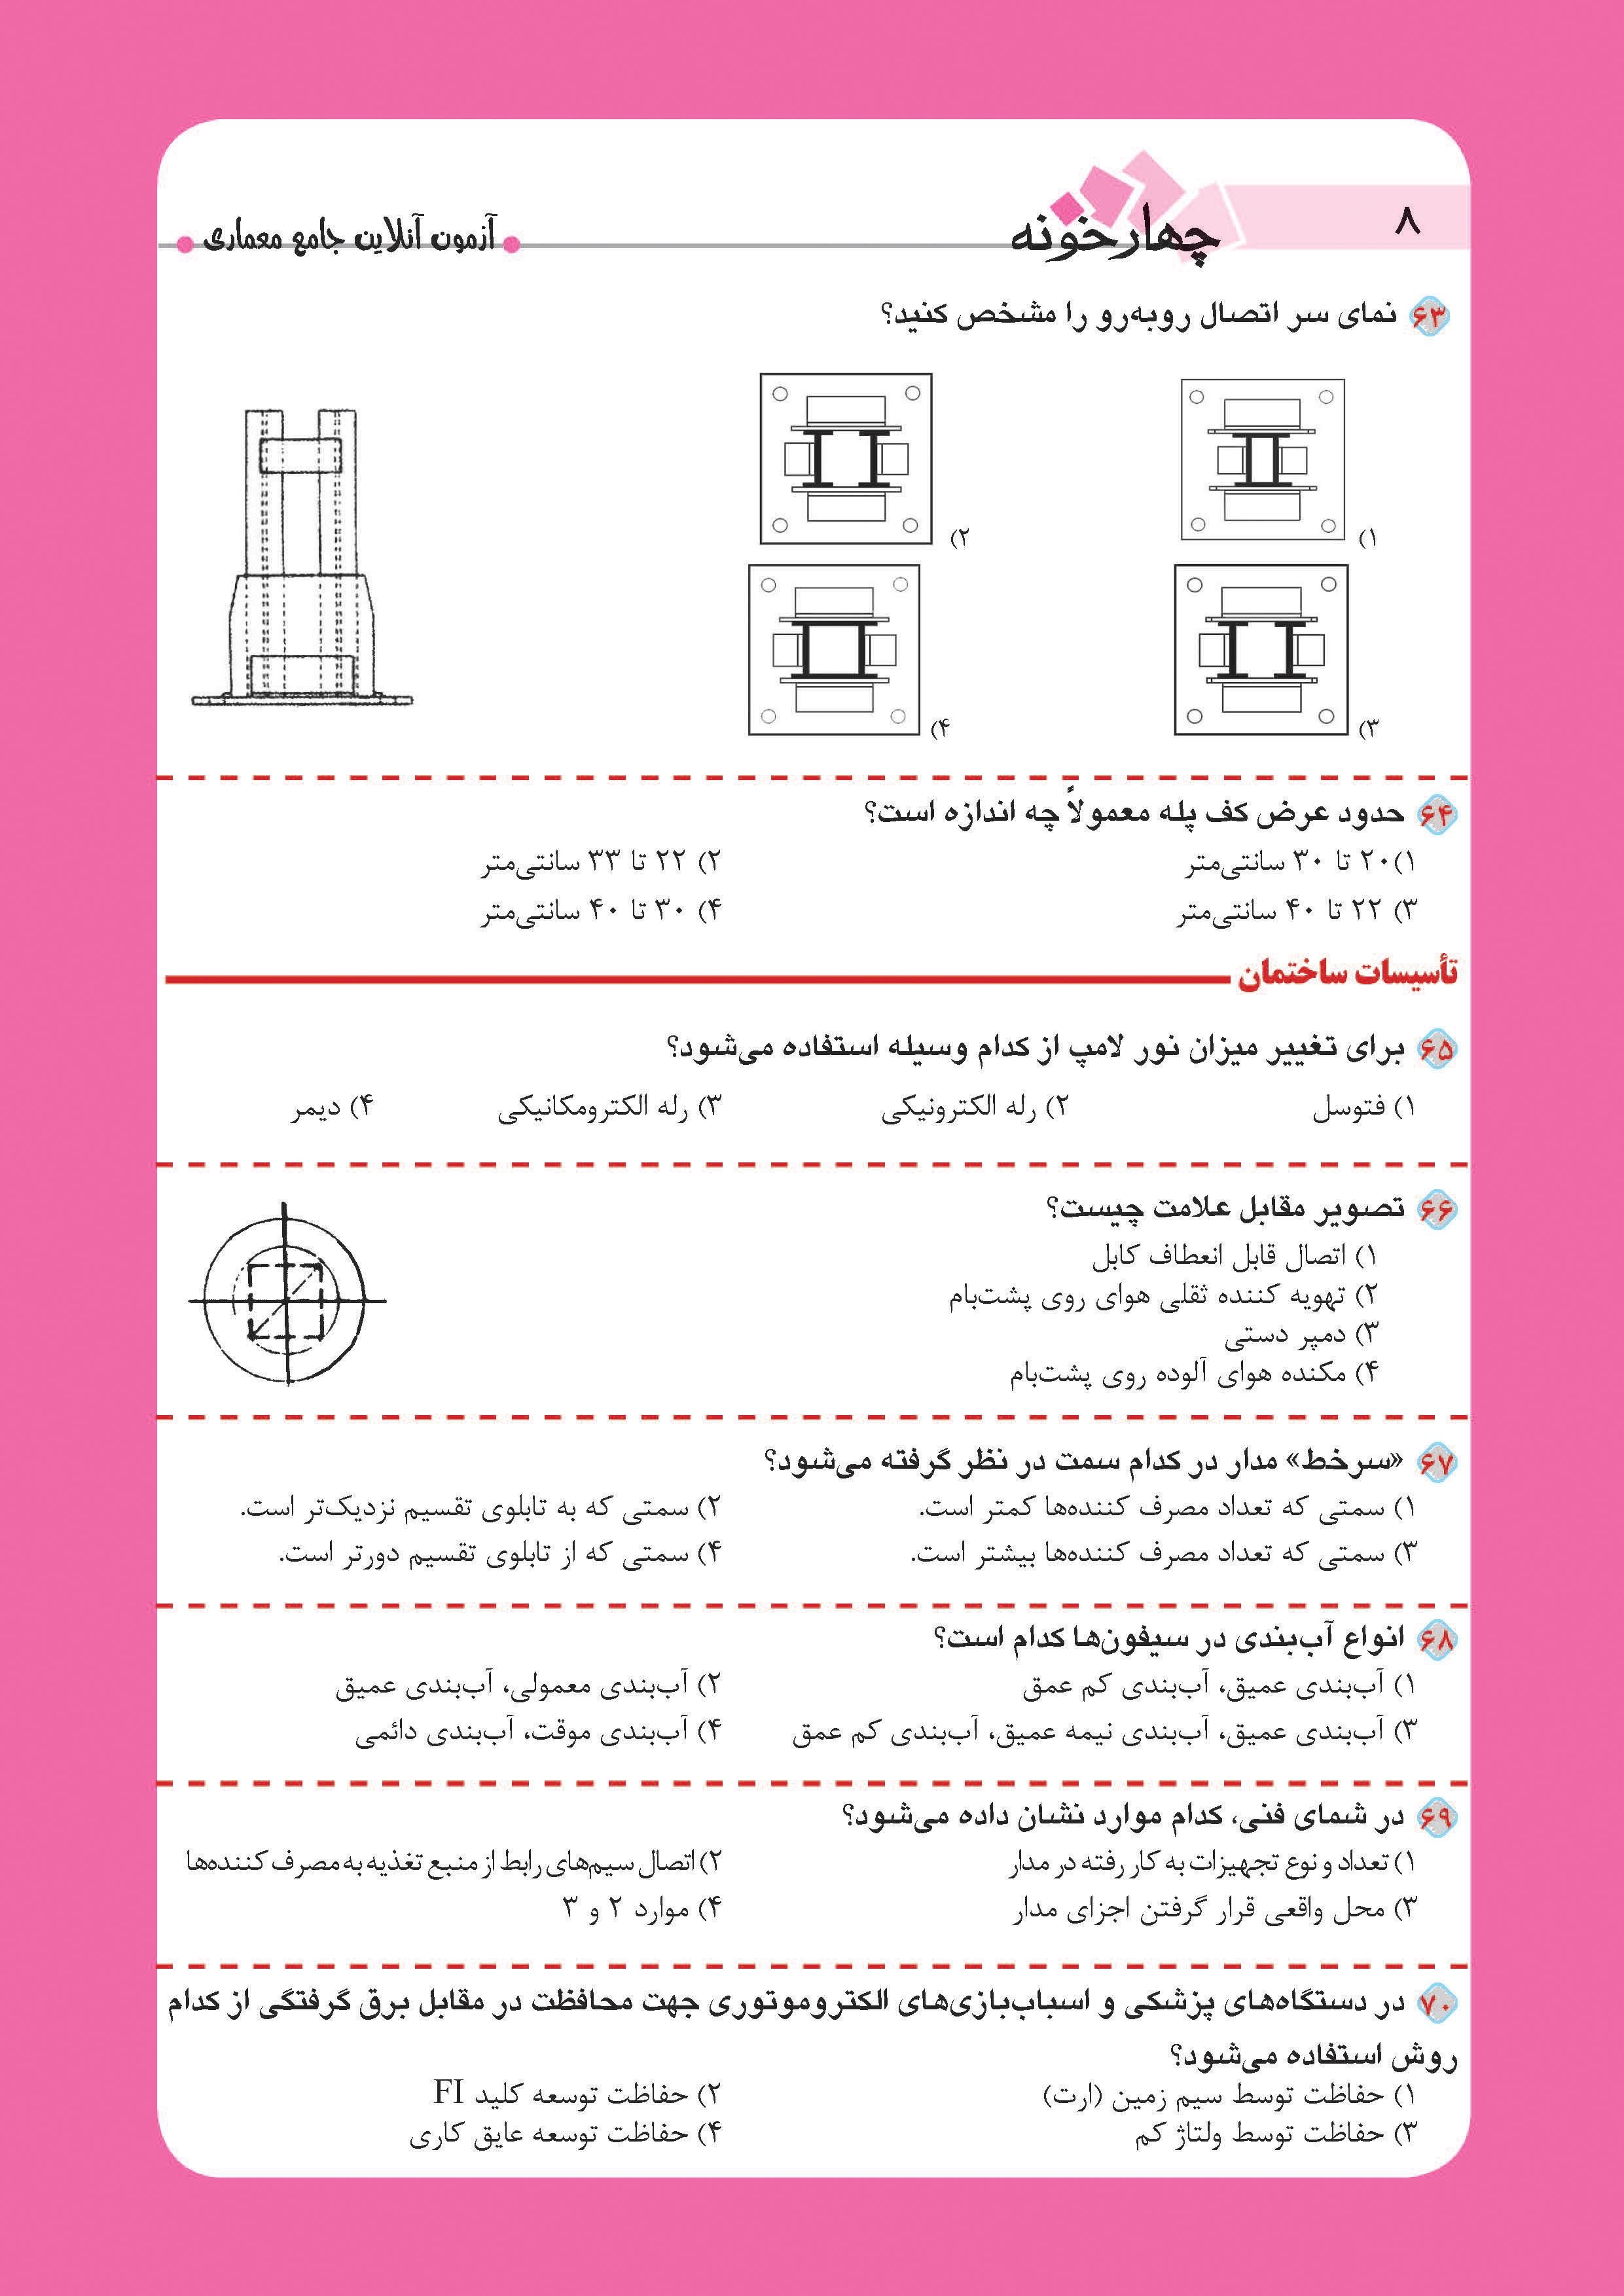 آزمون آنلاین معماری